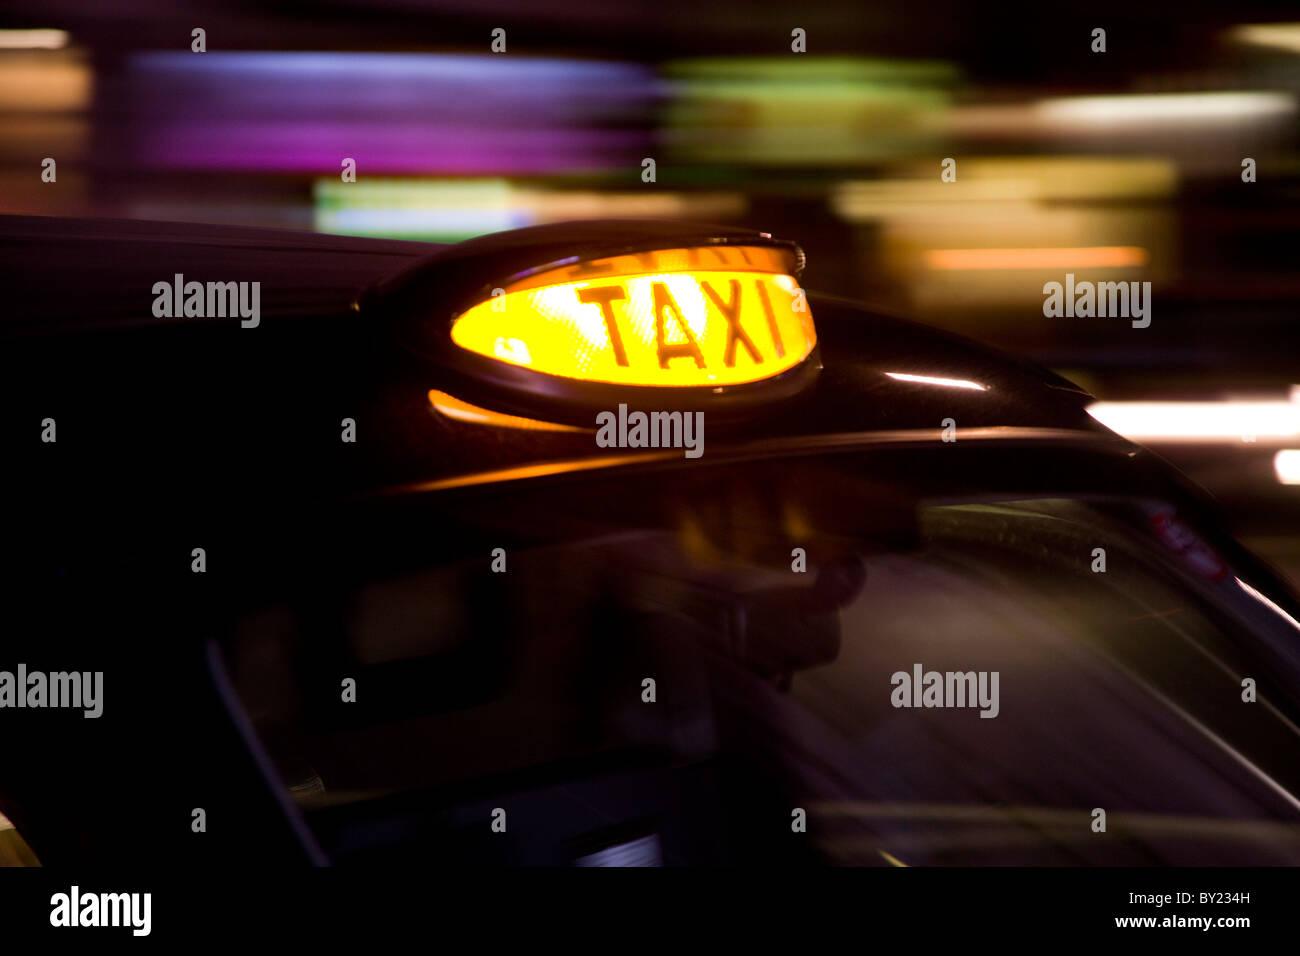 Taxicab at night, London, UK - Stock Image